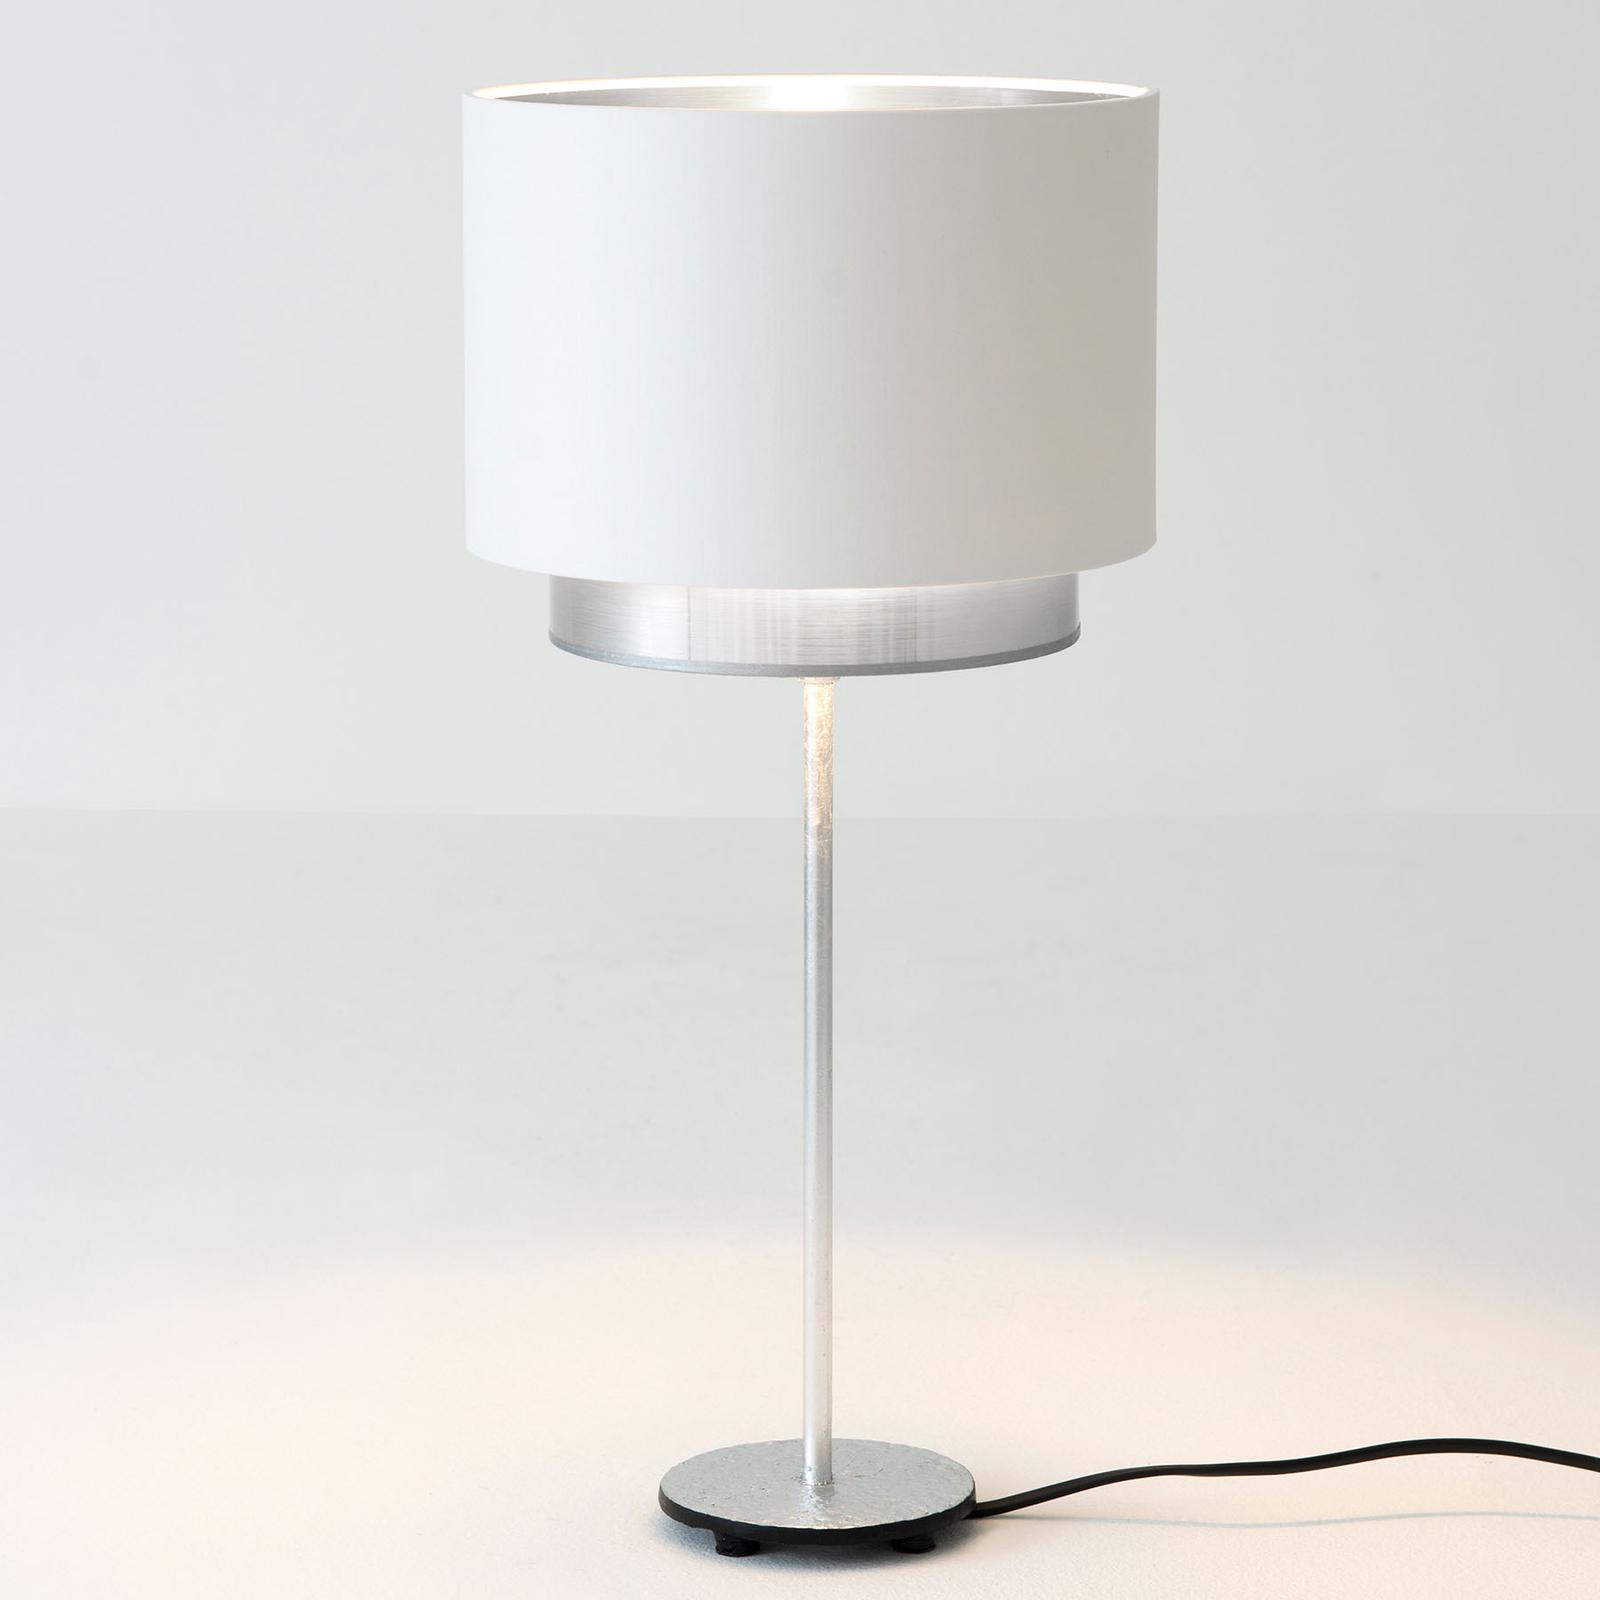 Tafellamp Mattia, Perla Silk wit/zilver